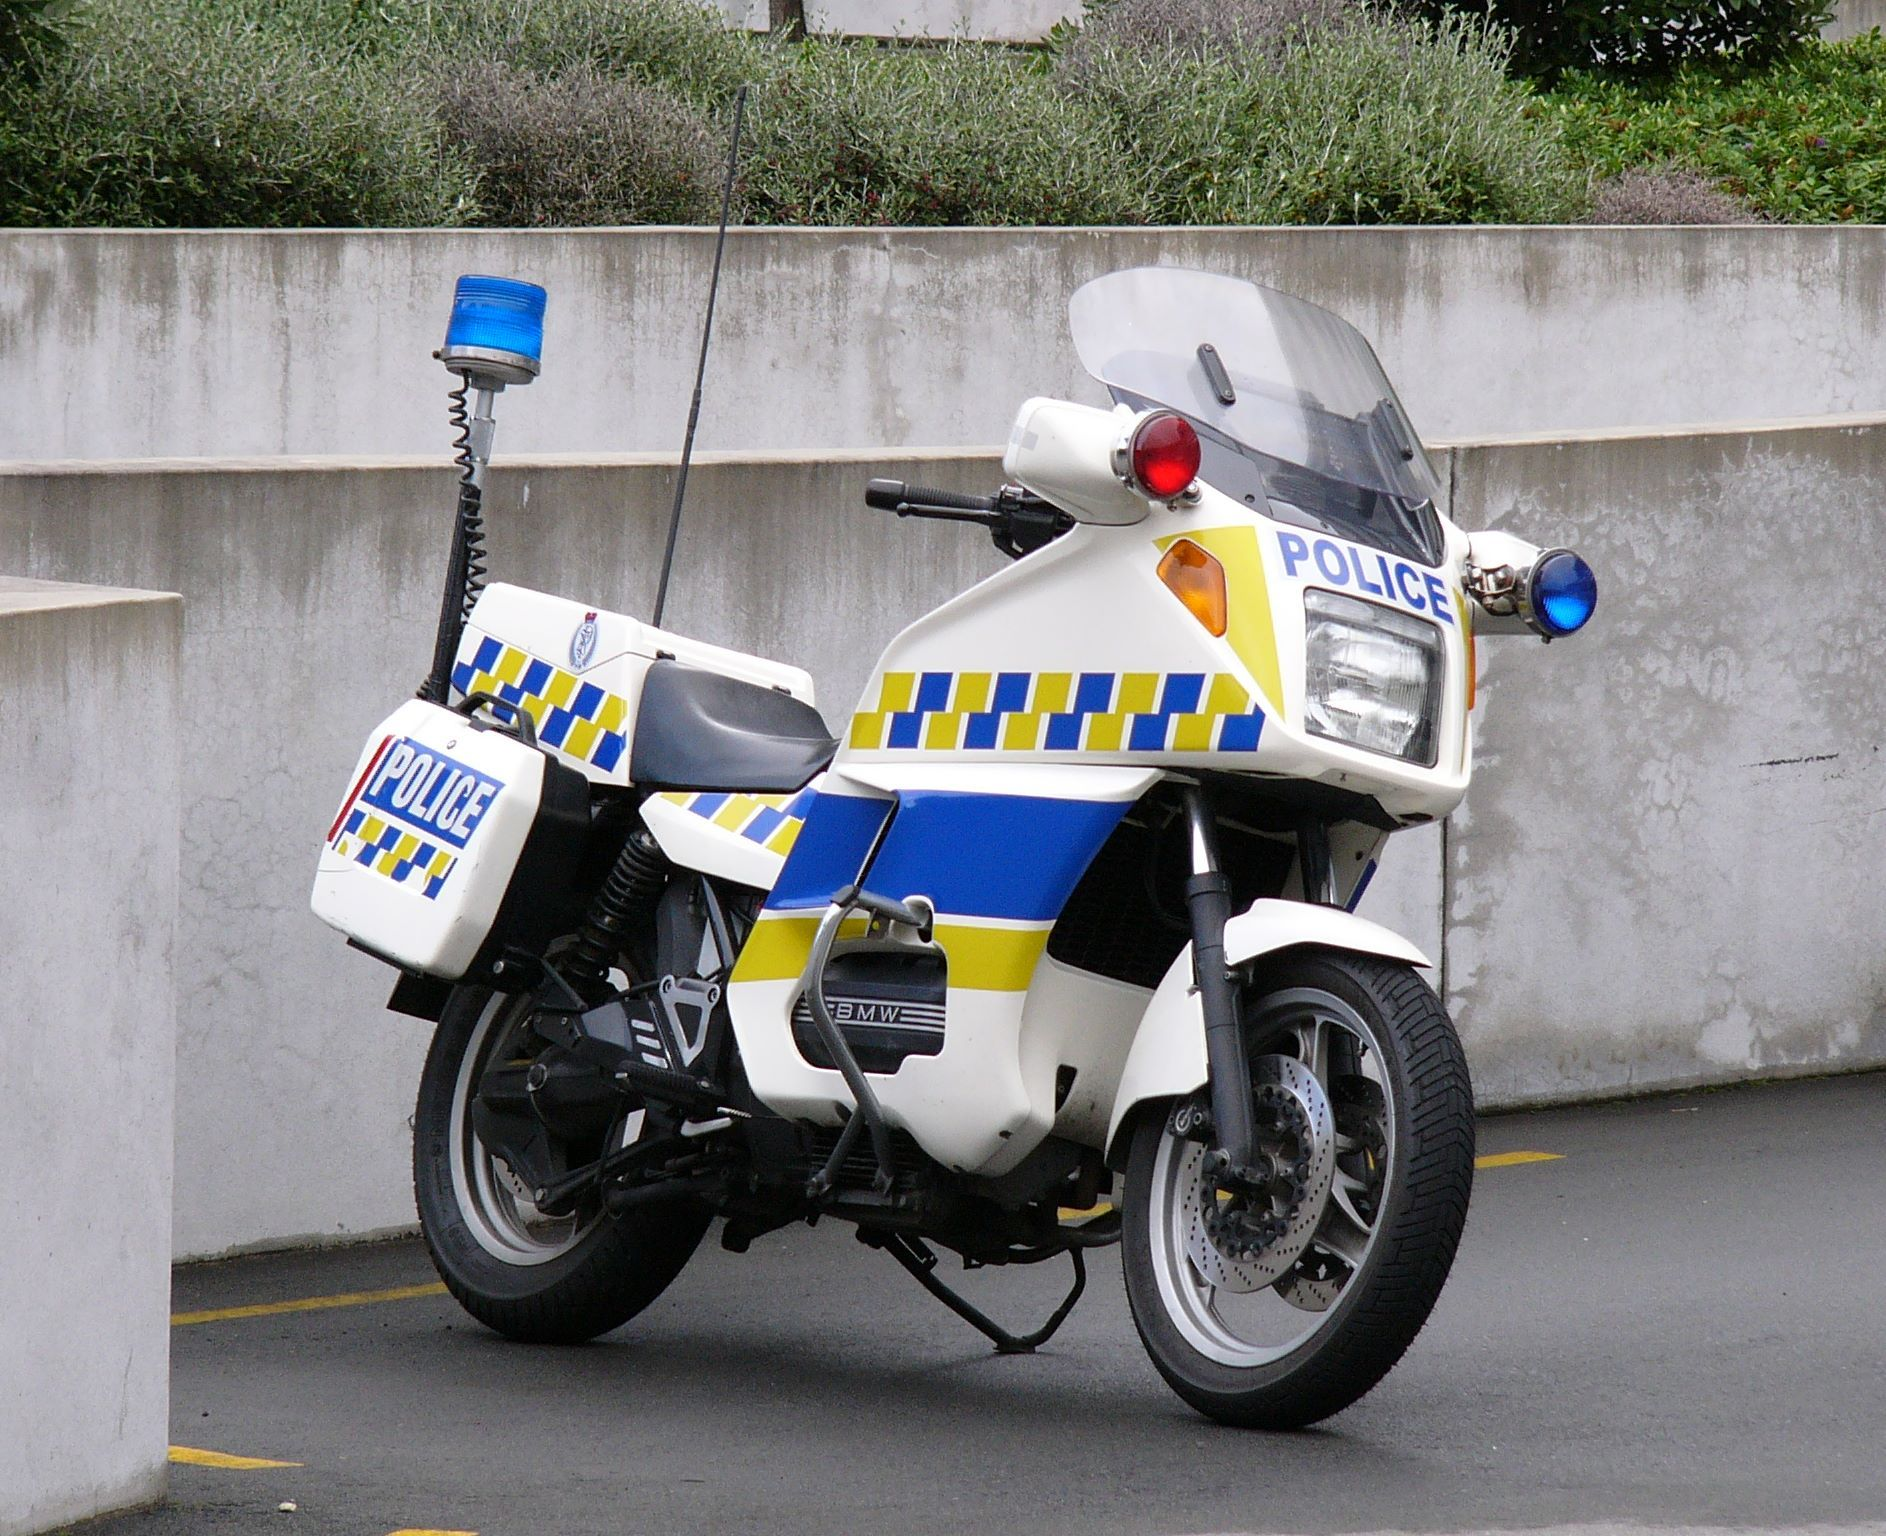 medium resolution of new zealand police motorcycle police motorcycle bmw setcom http